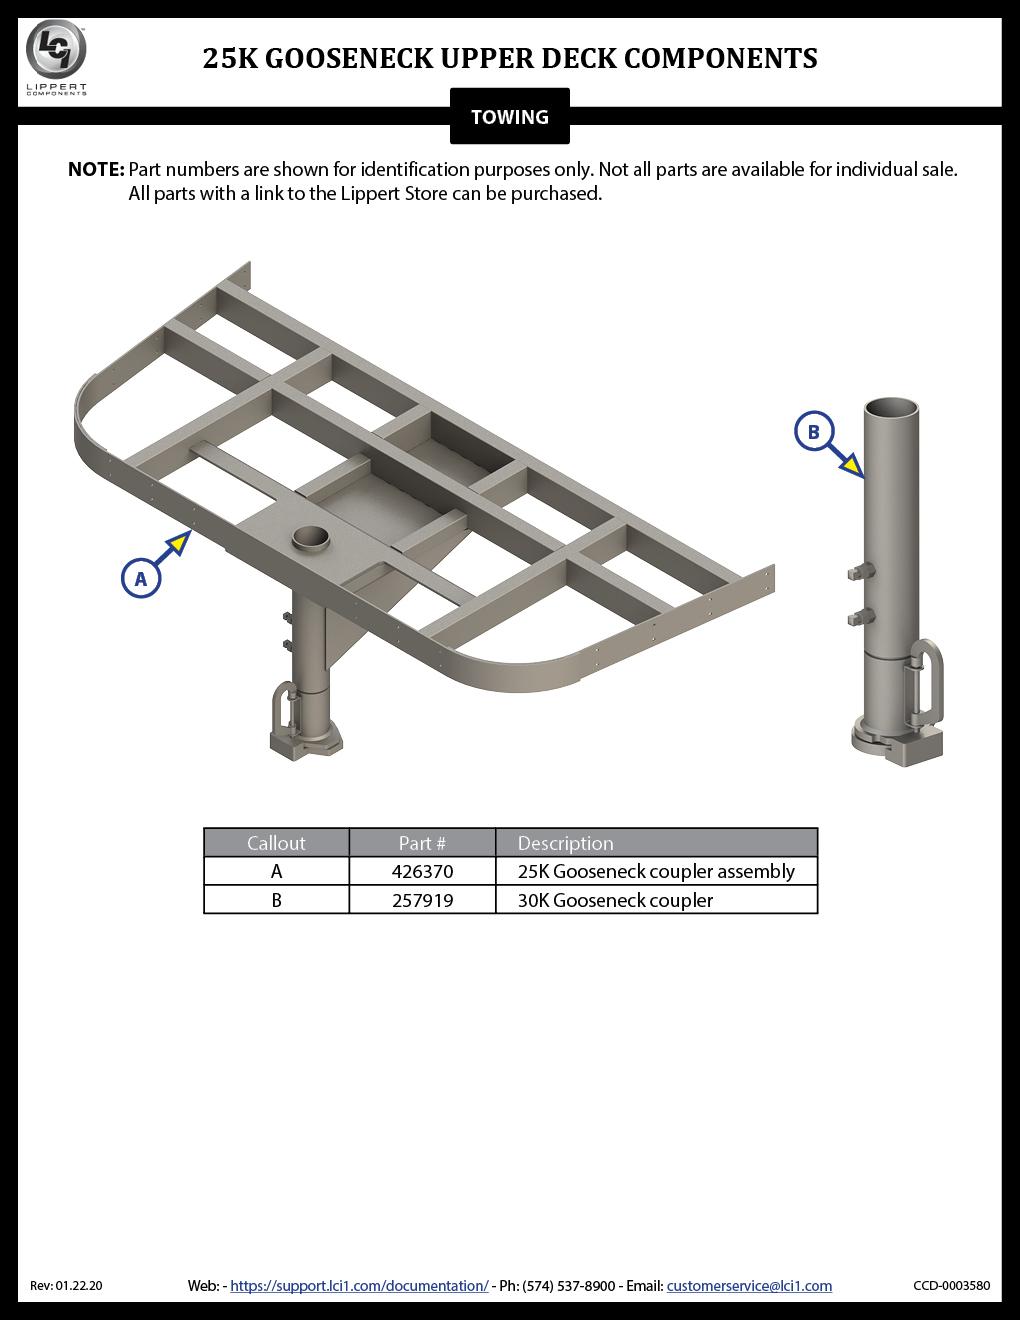 25K Gooseneck Upper Deck Components